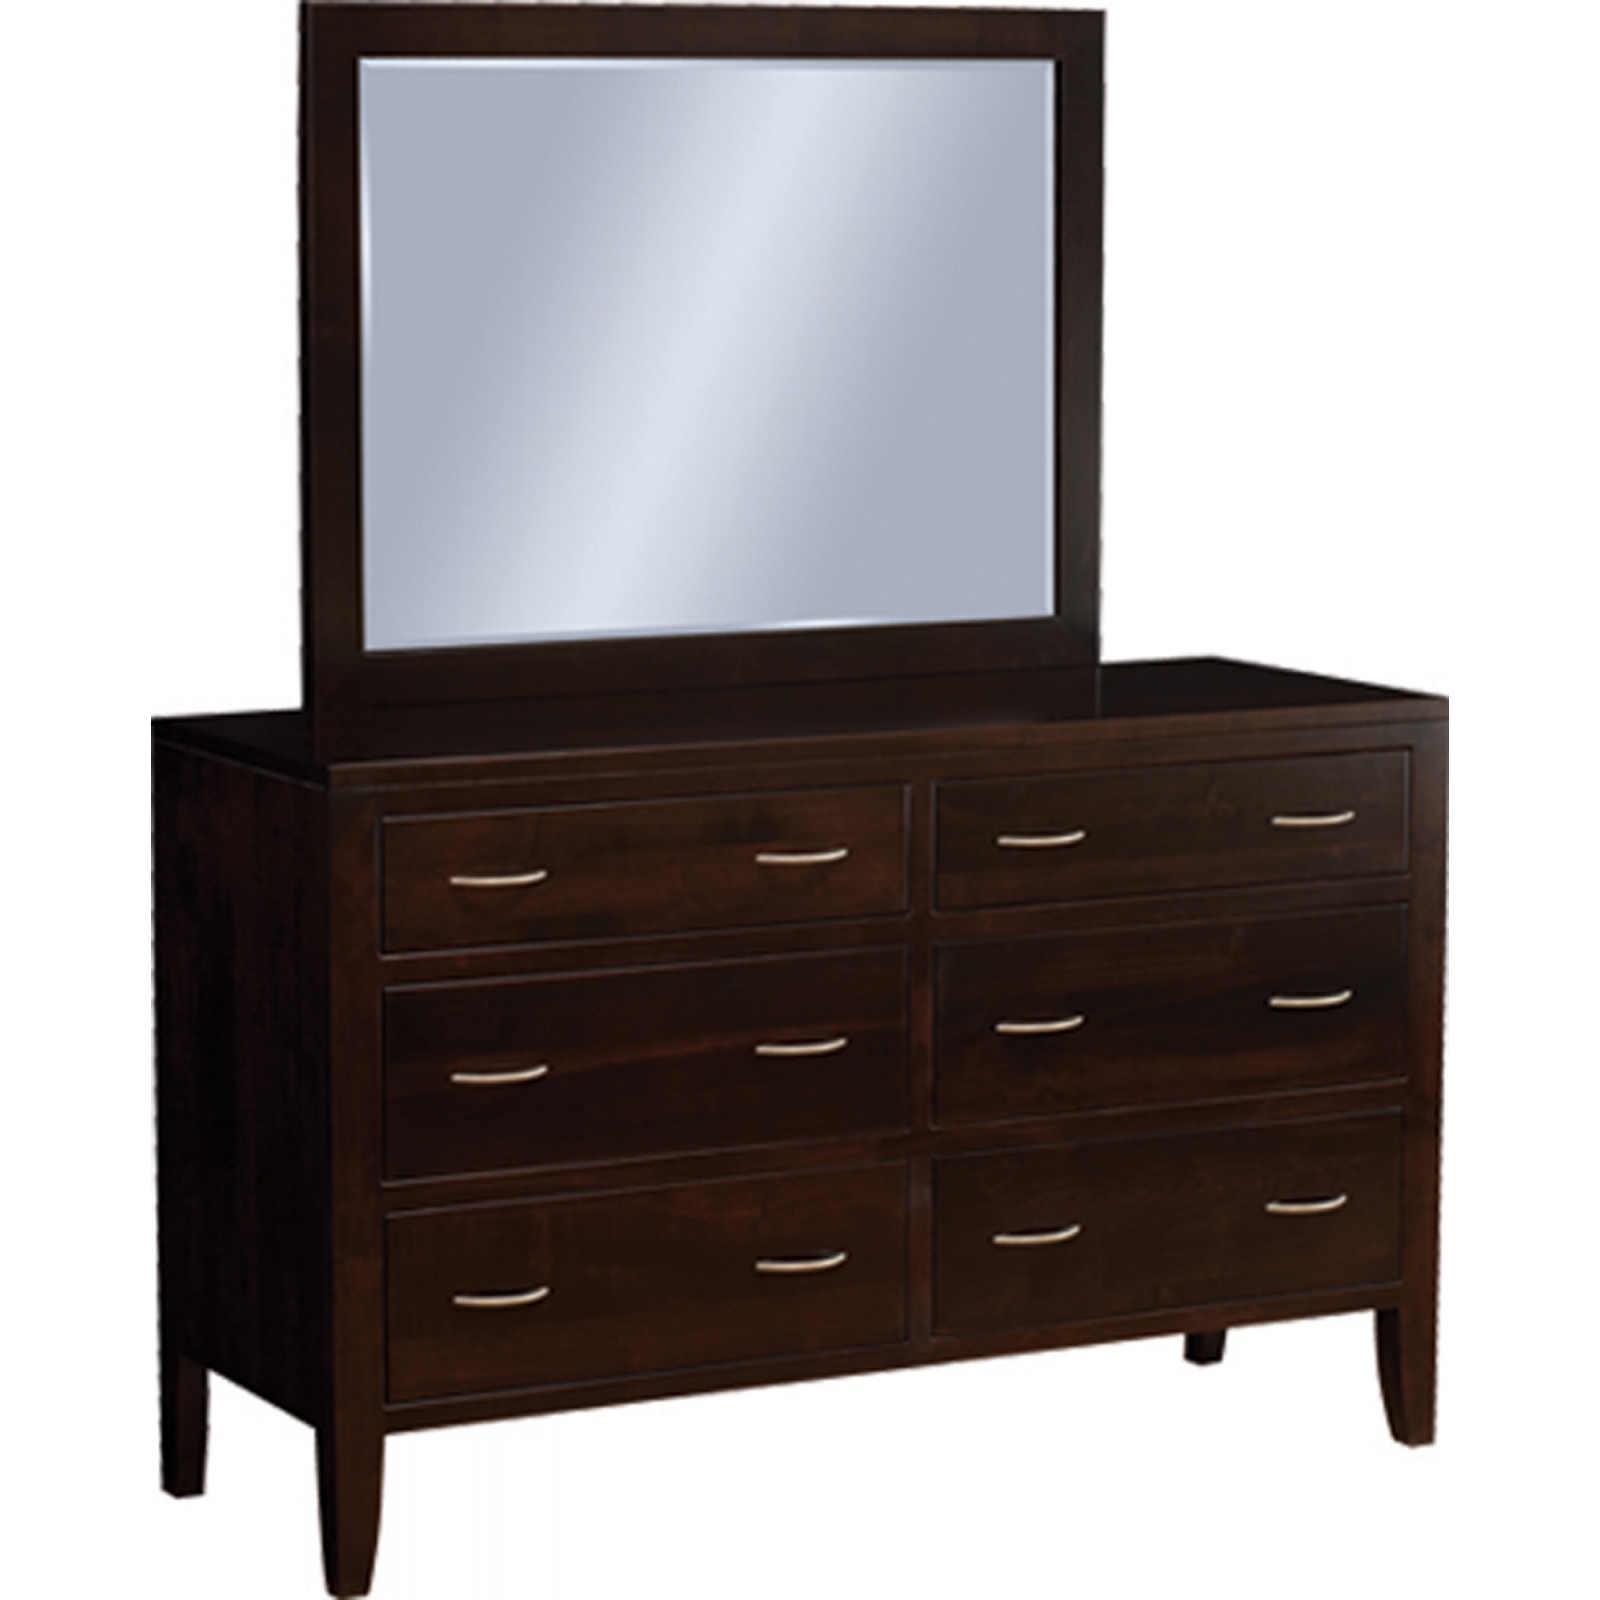 Barrington Bedroom Collection 1354 Double Dresser